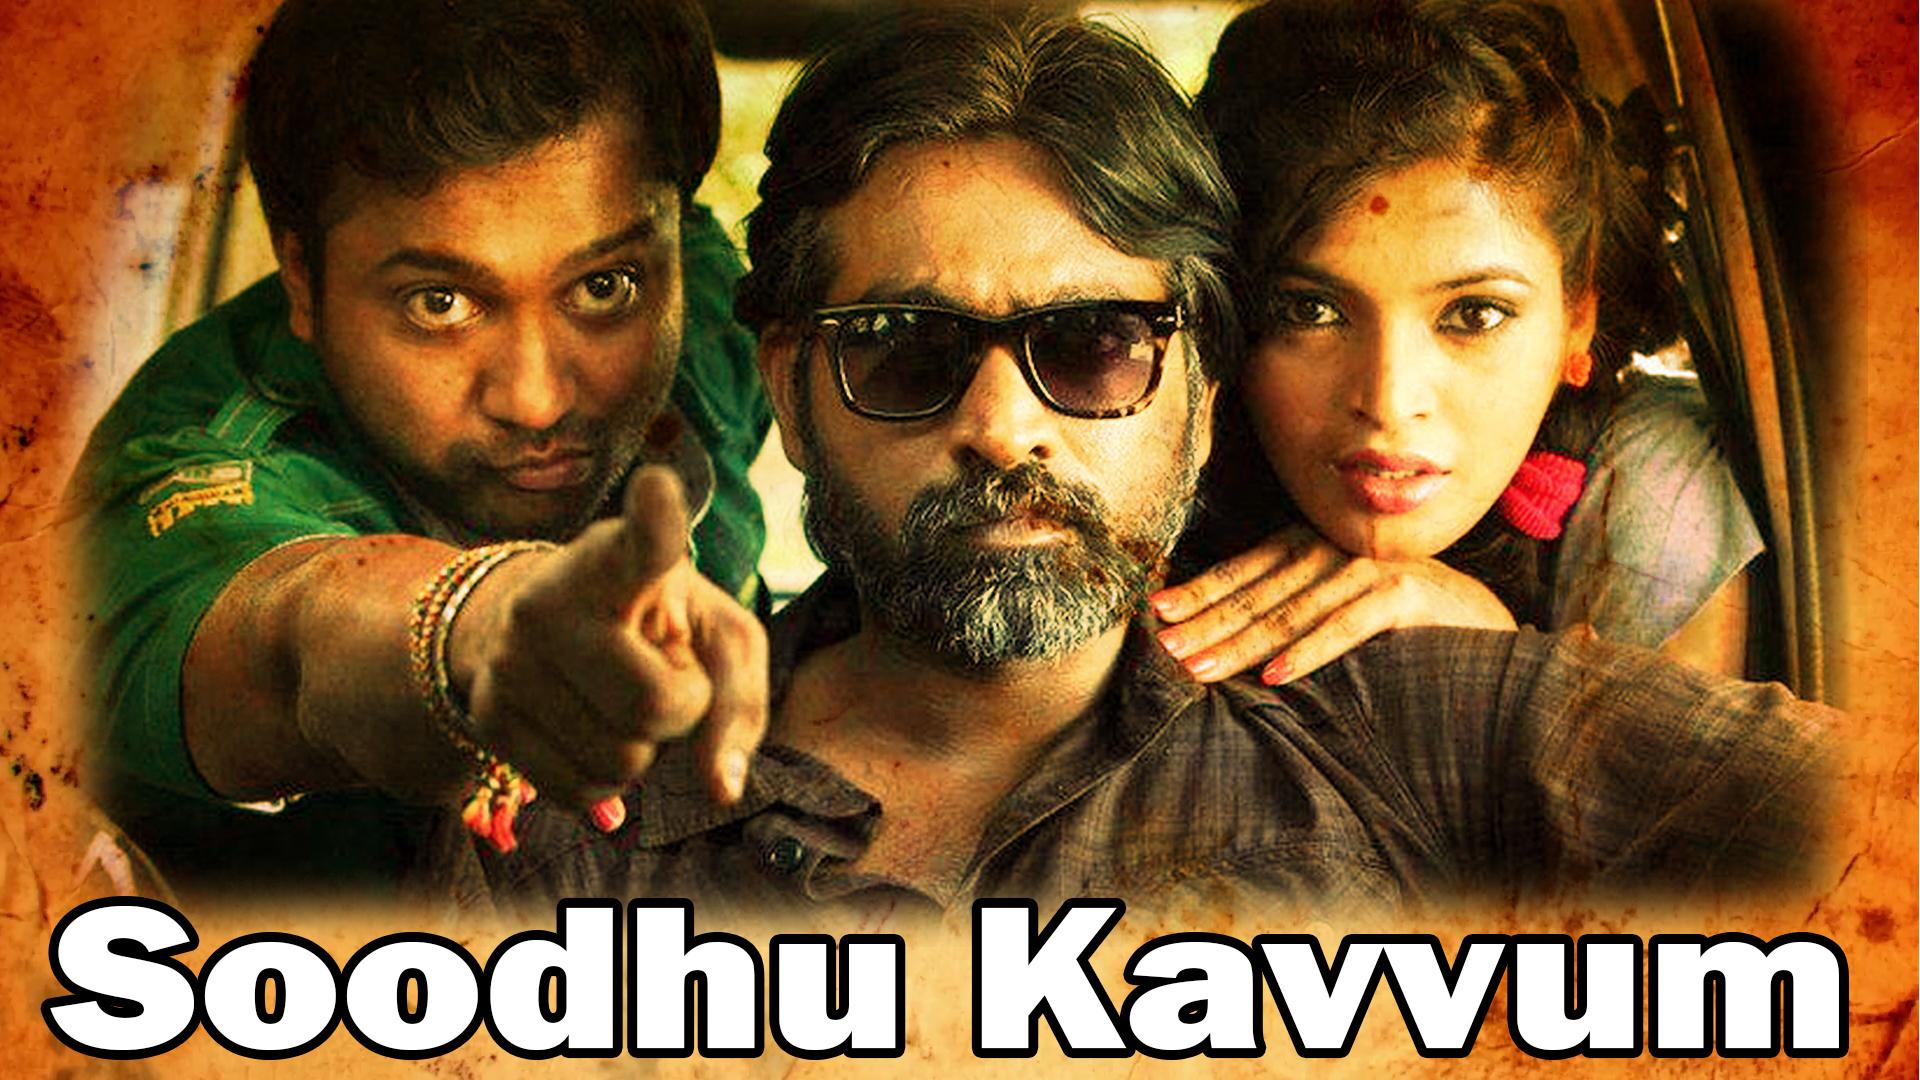 Amazon com: Watch Soodhu Kavvum | Prime Video